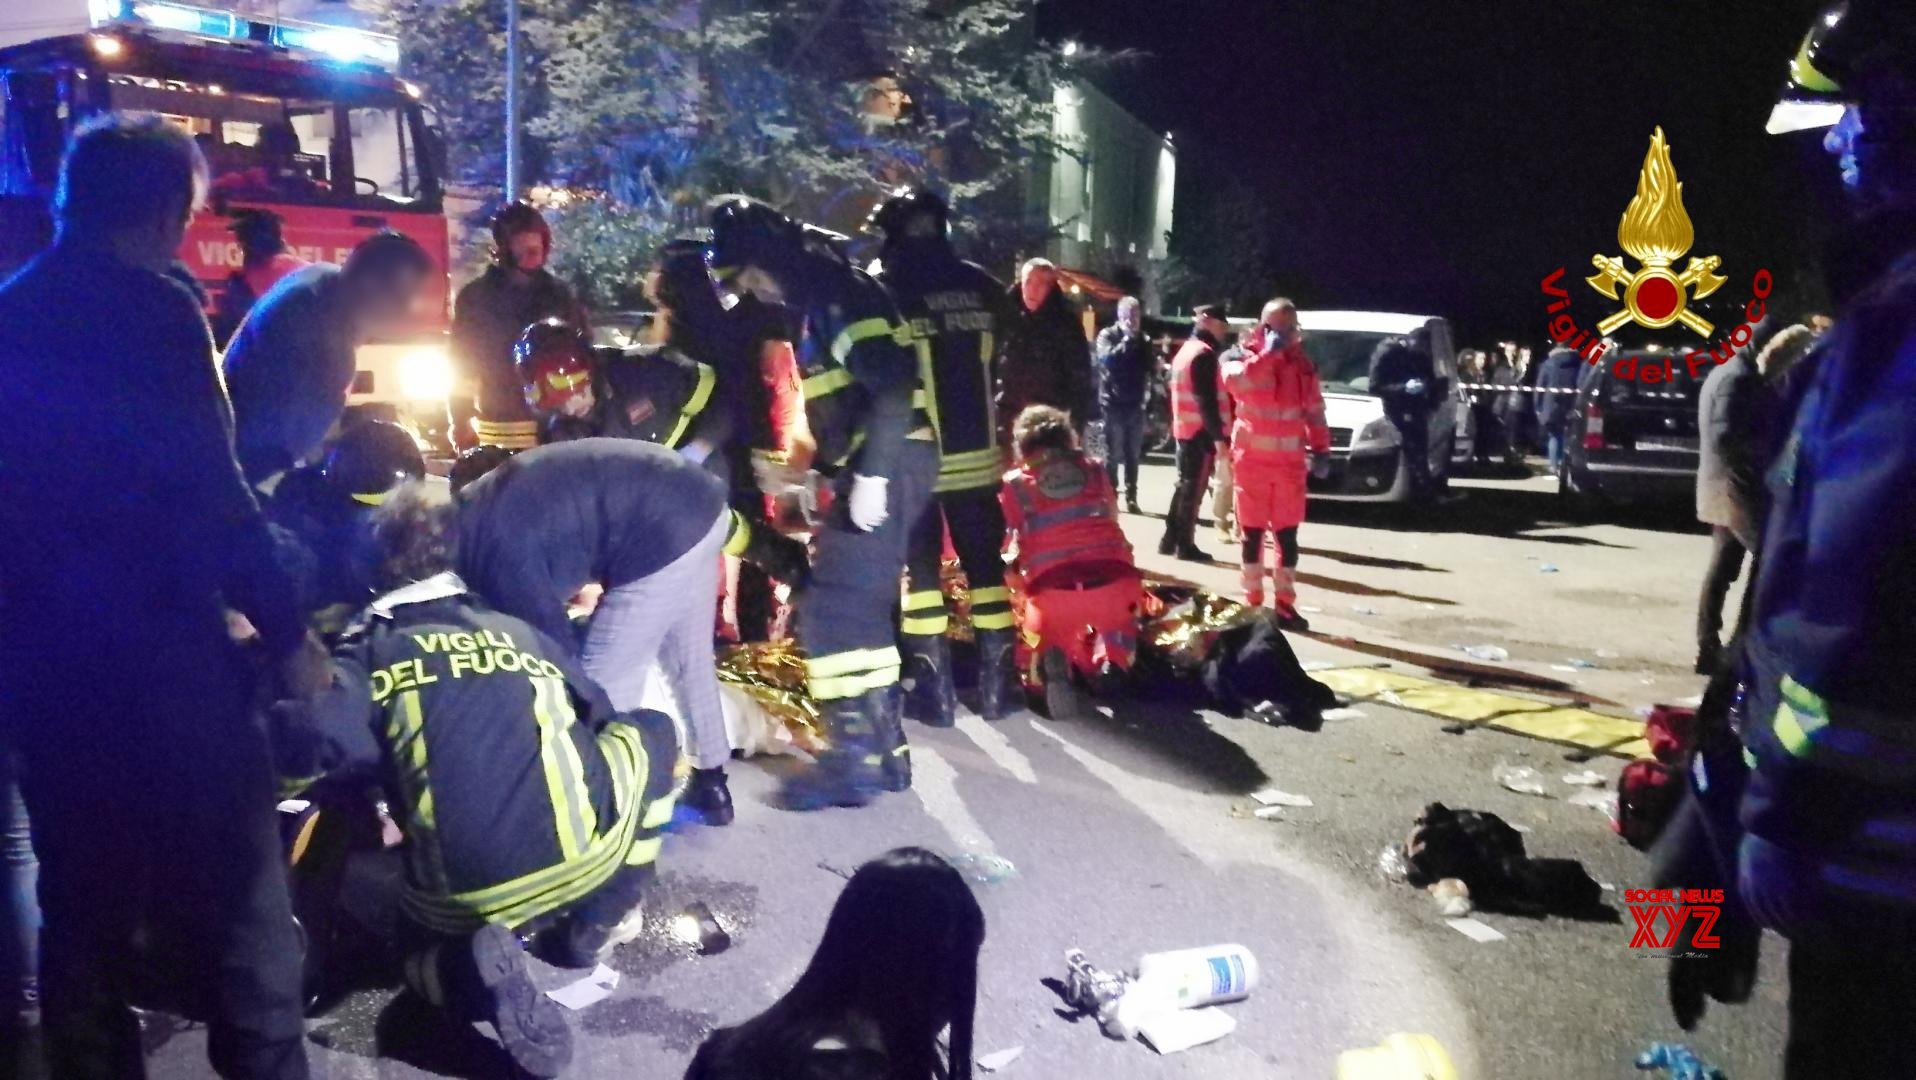 6 killed in Italy nightclub stampede